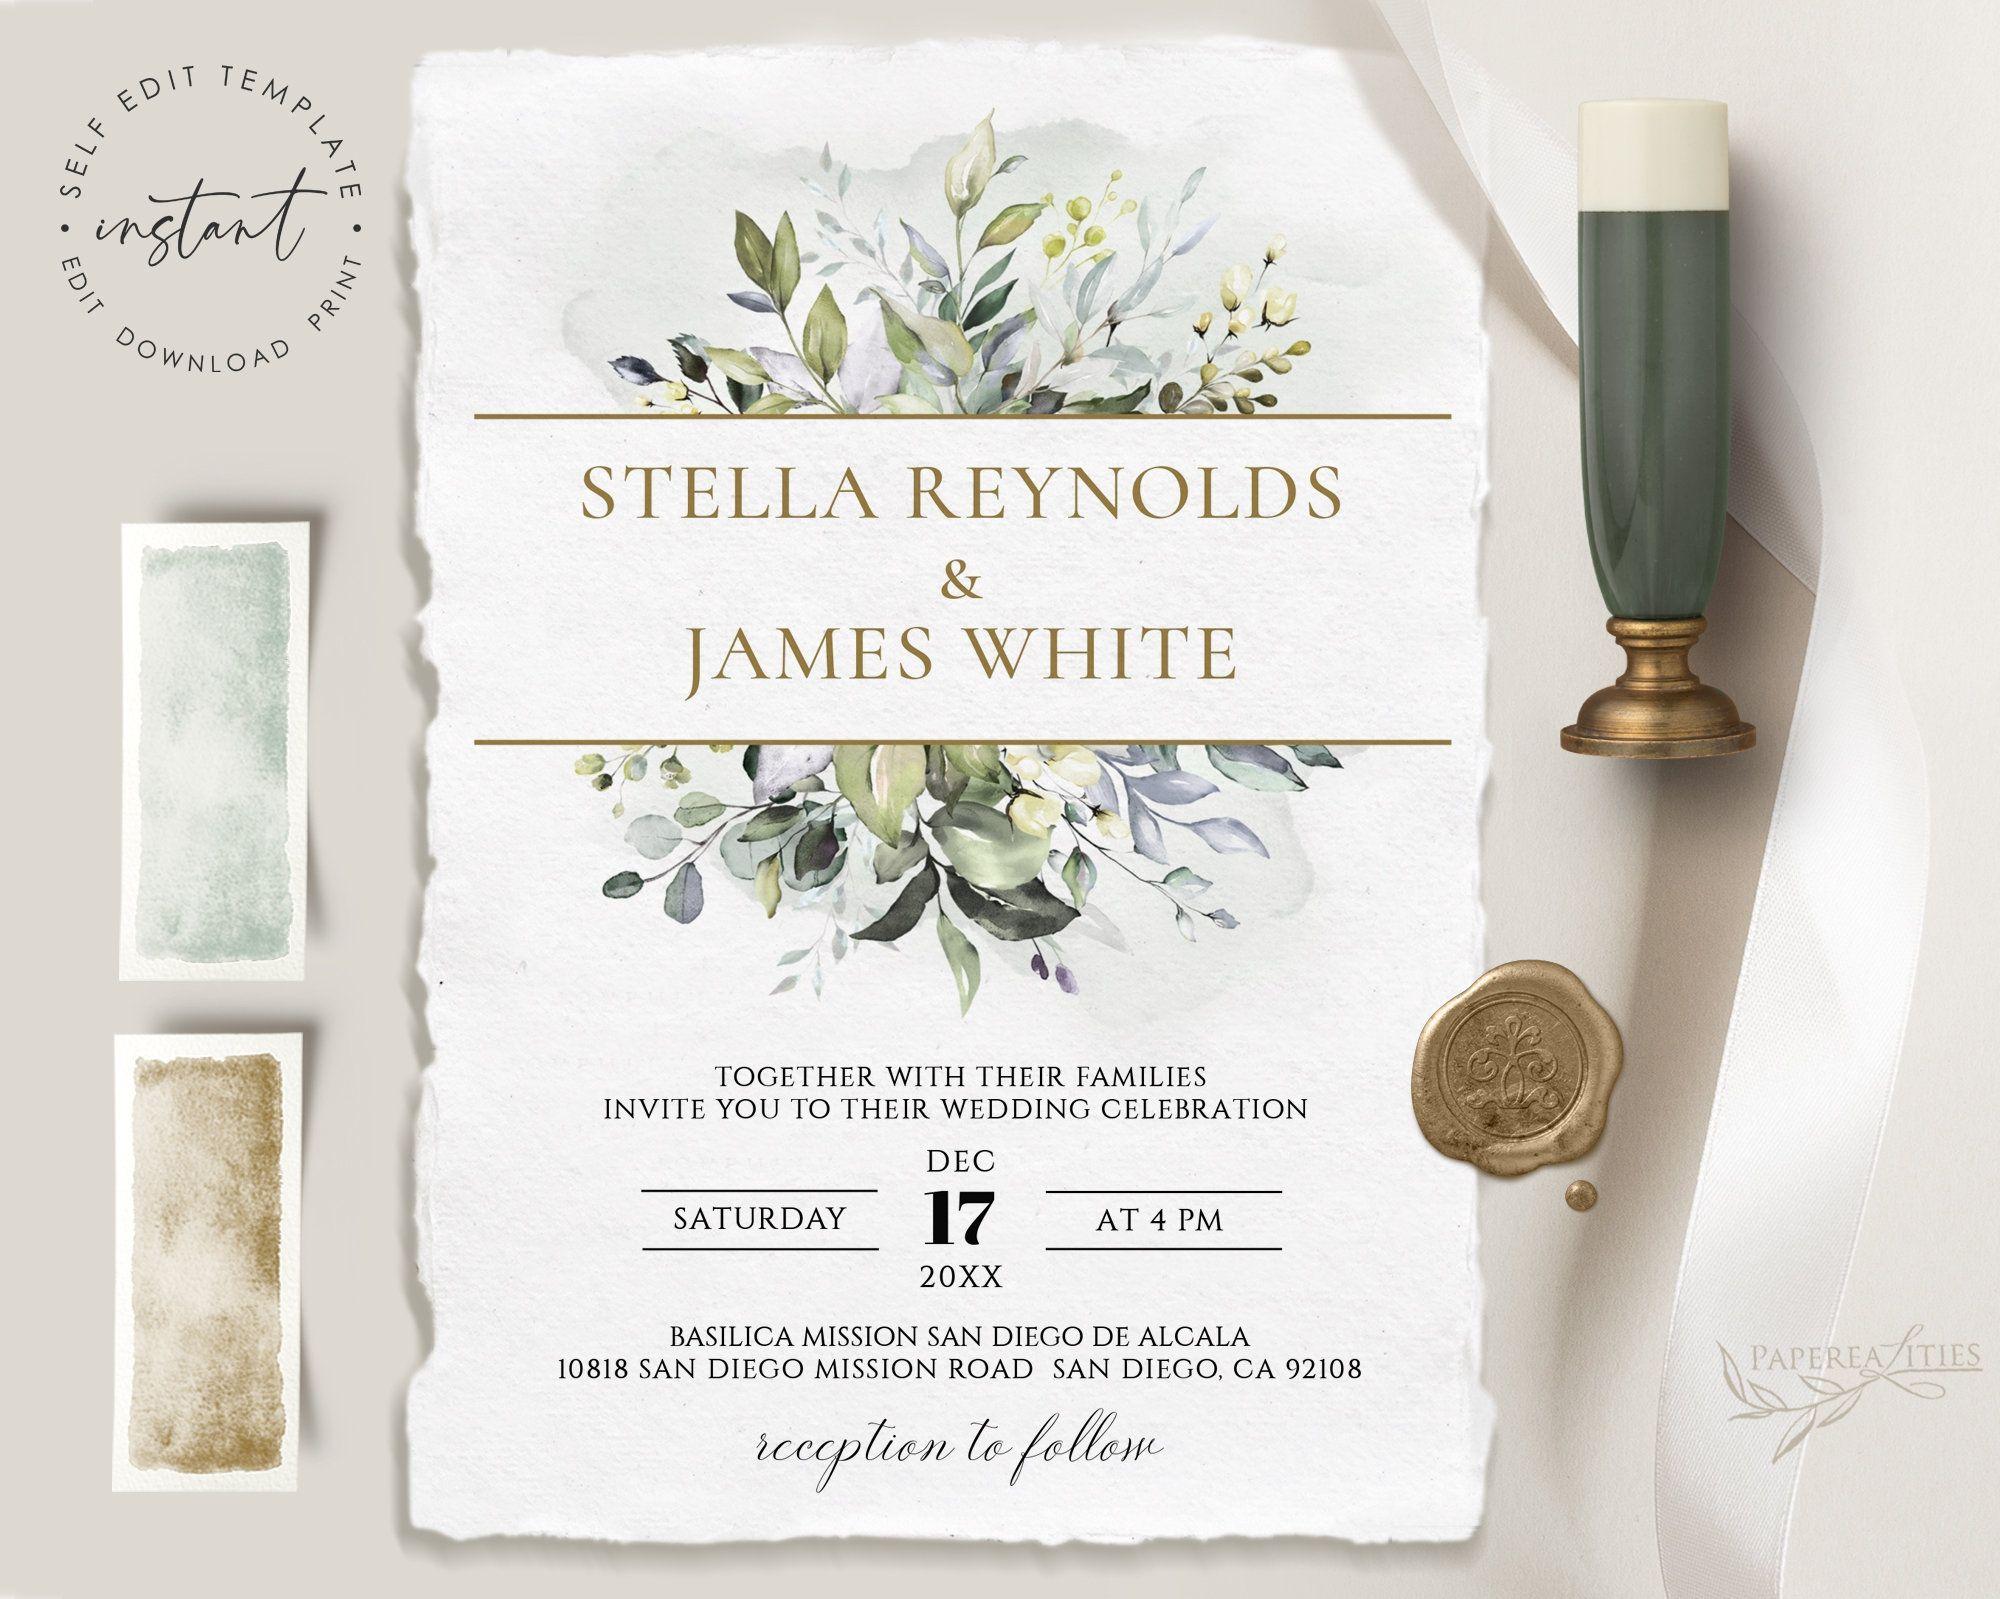 Stella Wedding Invitation Template Download Botanical Etsy In 2021 Botanical Wedding Invitations Wedding Invitation Templates Botanical Wedding Stationery